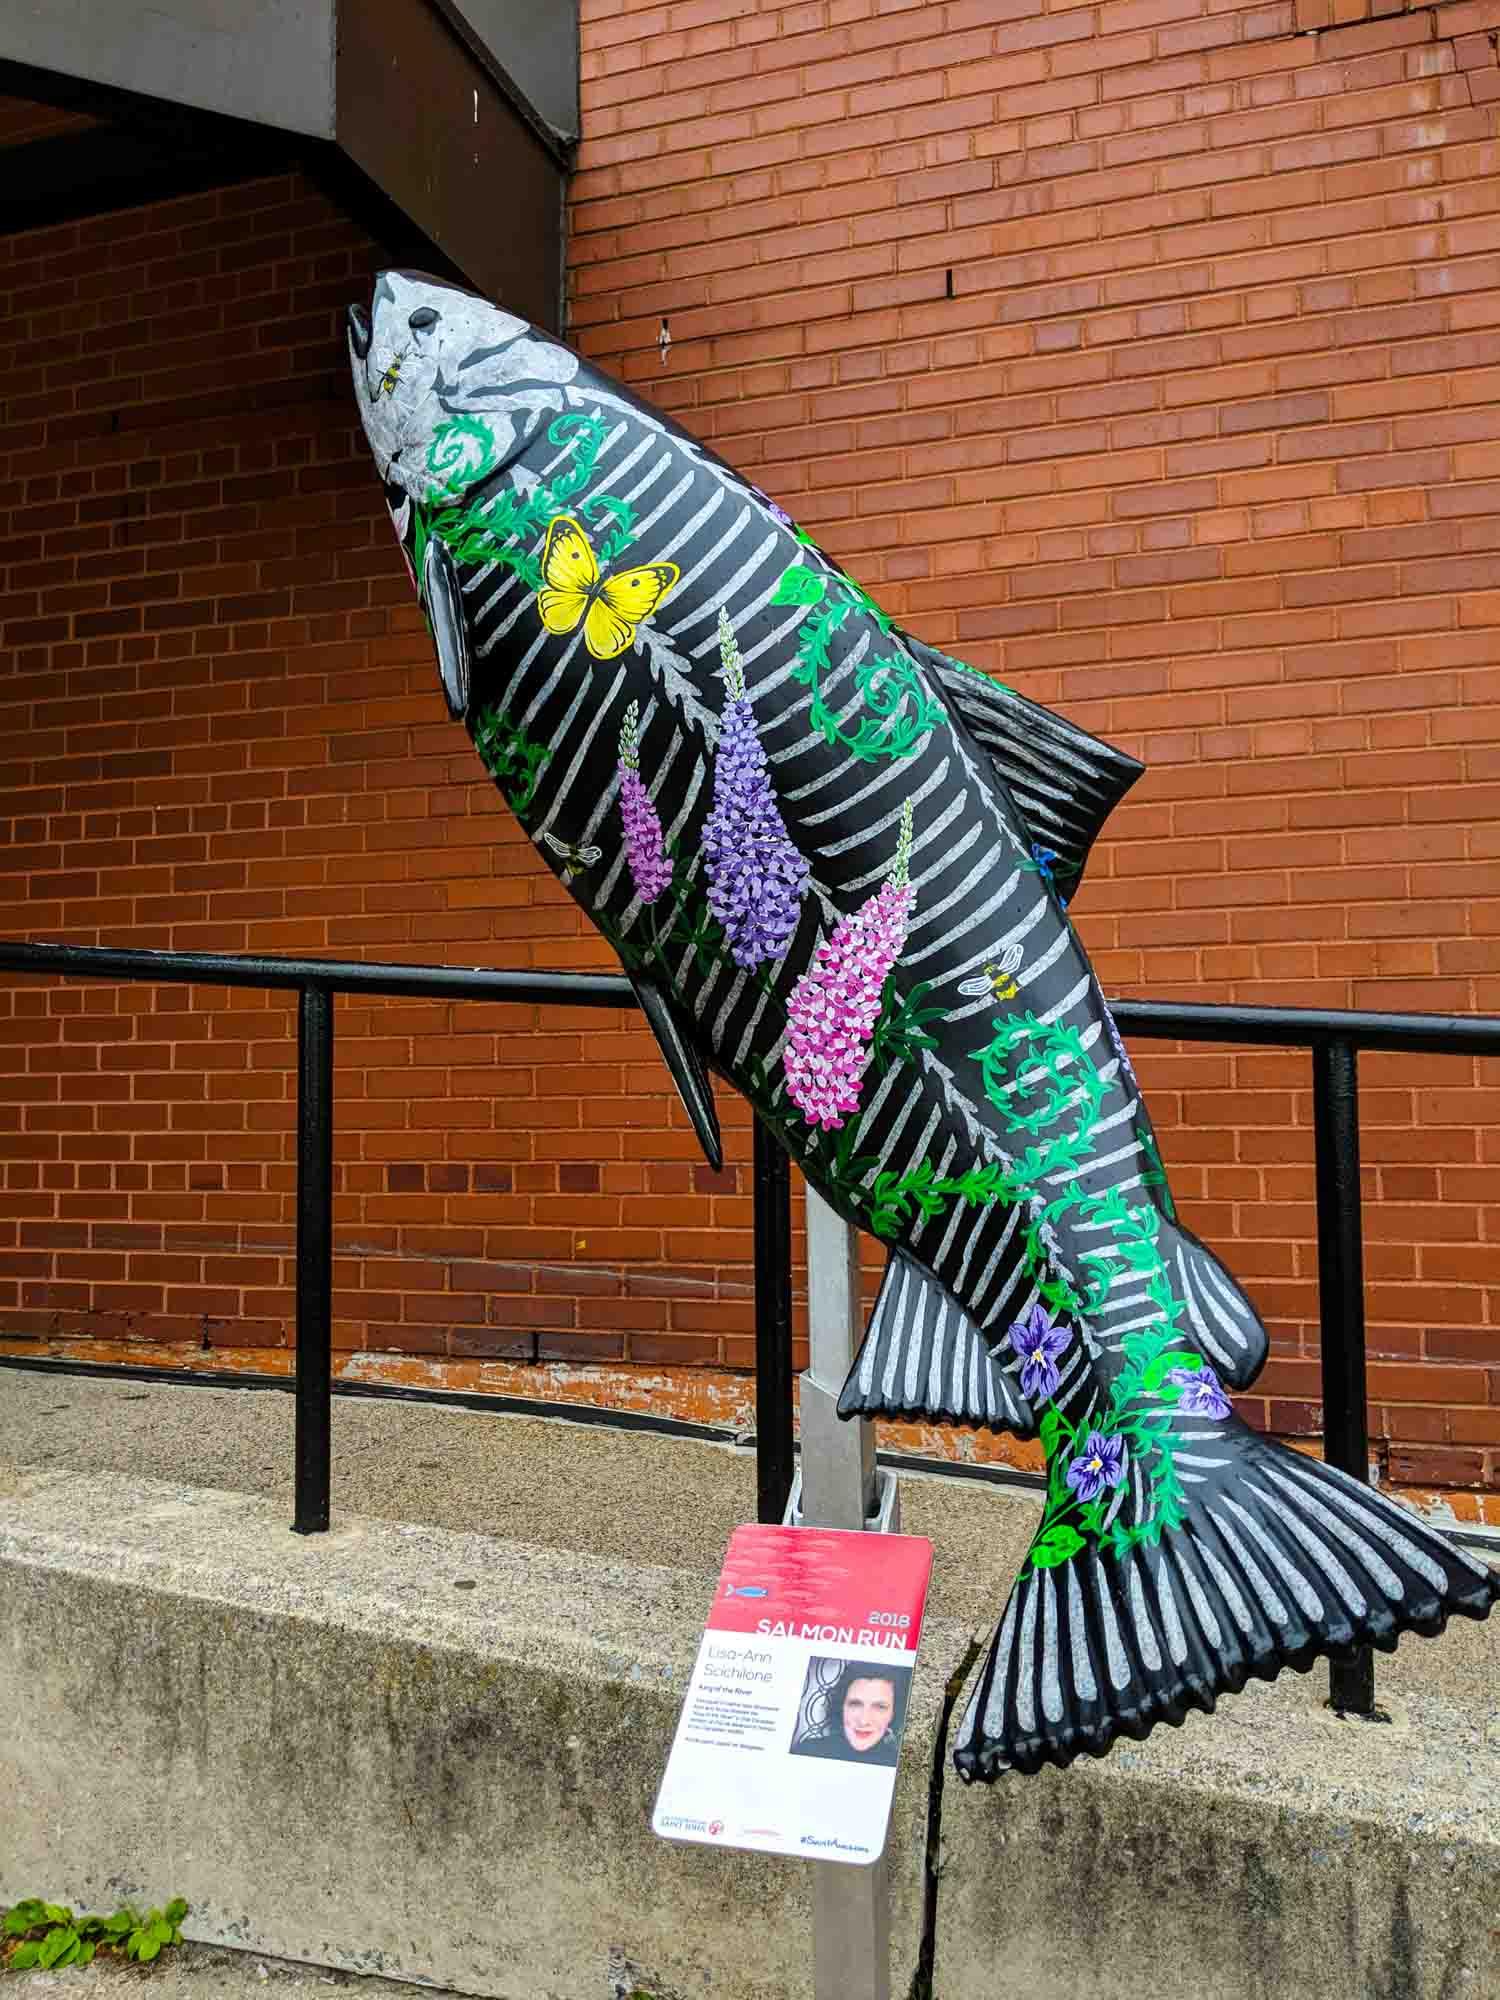 Painted salmon artwork in Saint John